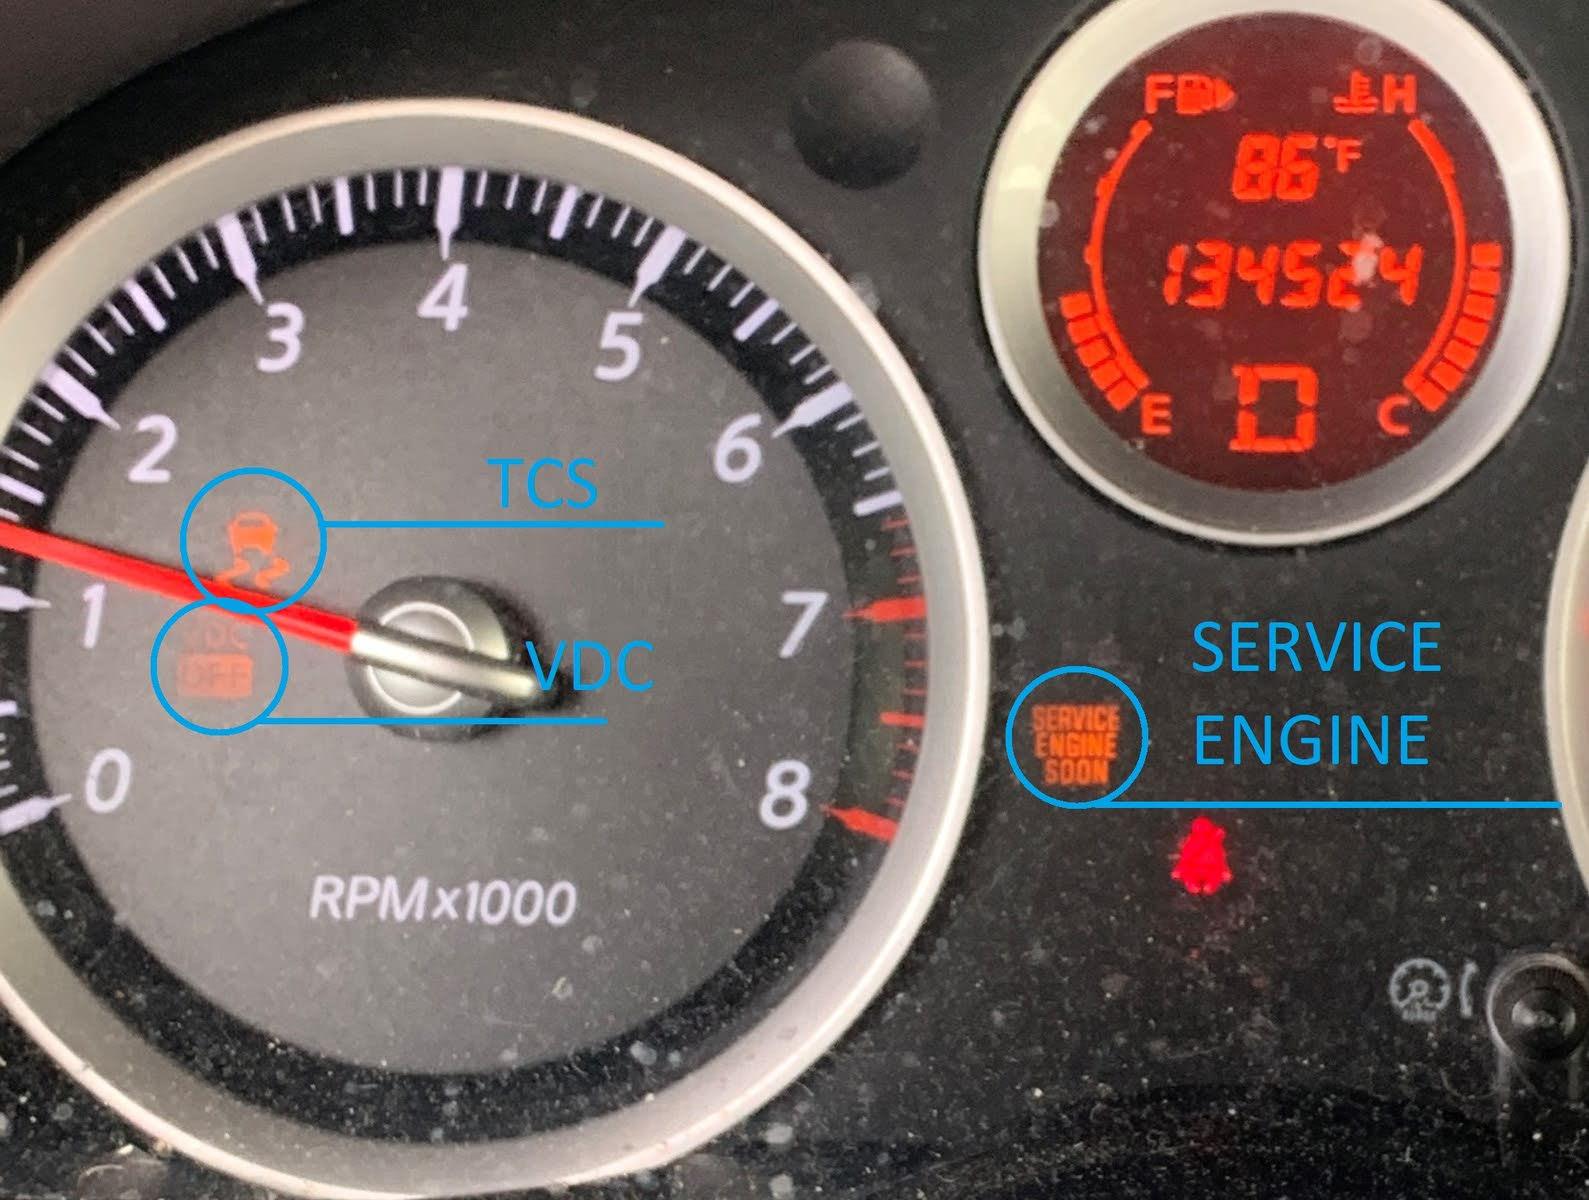 Nissan Sentra Questions - Vdc light check engine light car